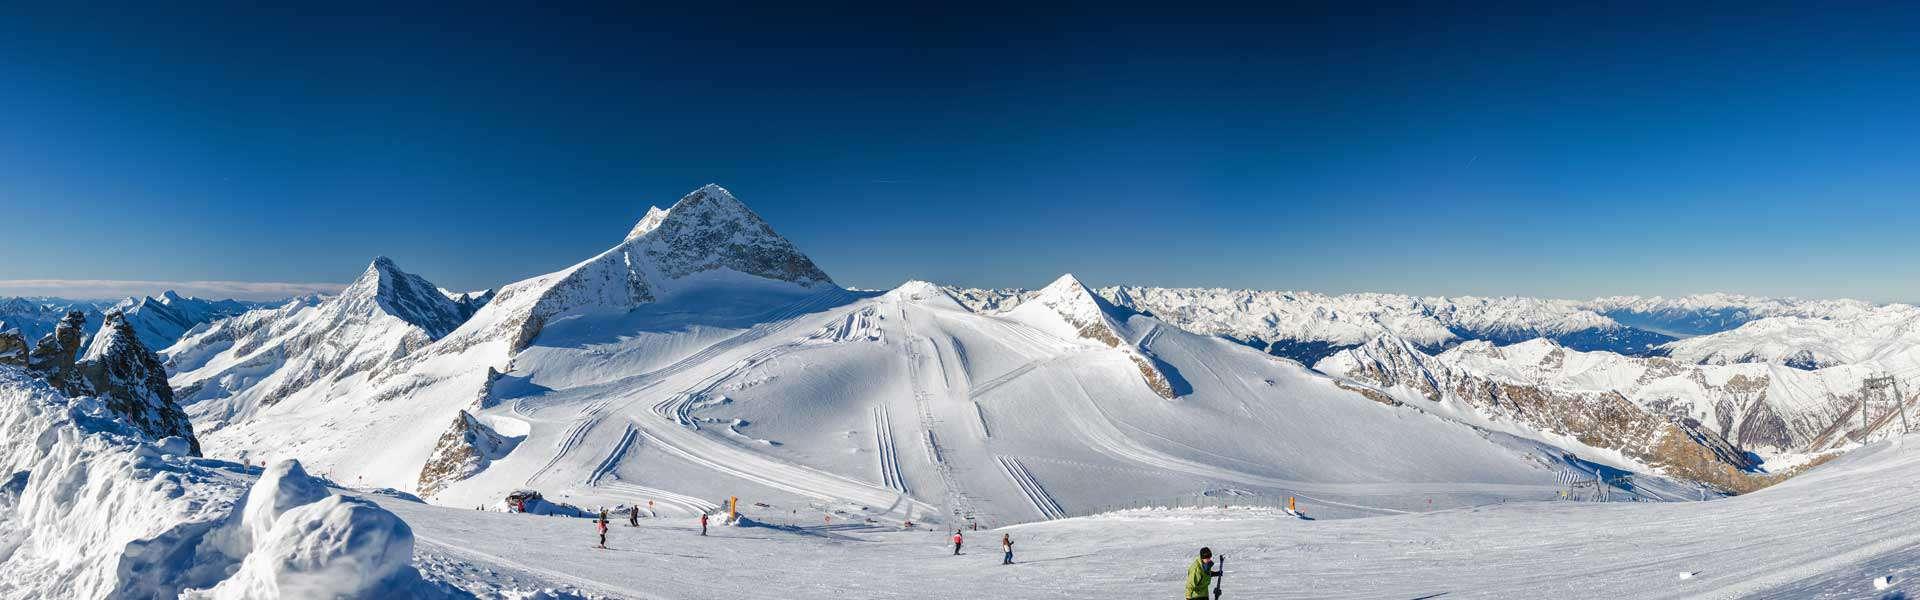 Hintertuxer Gletscher im Zillertal in Tirol